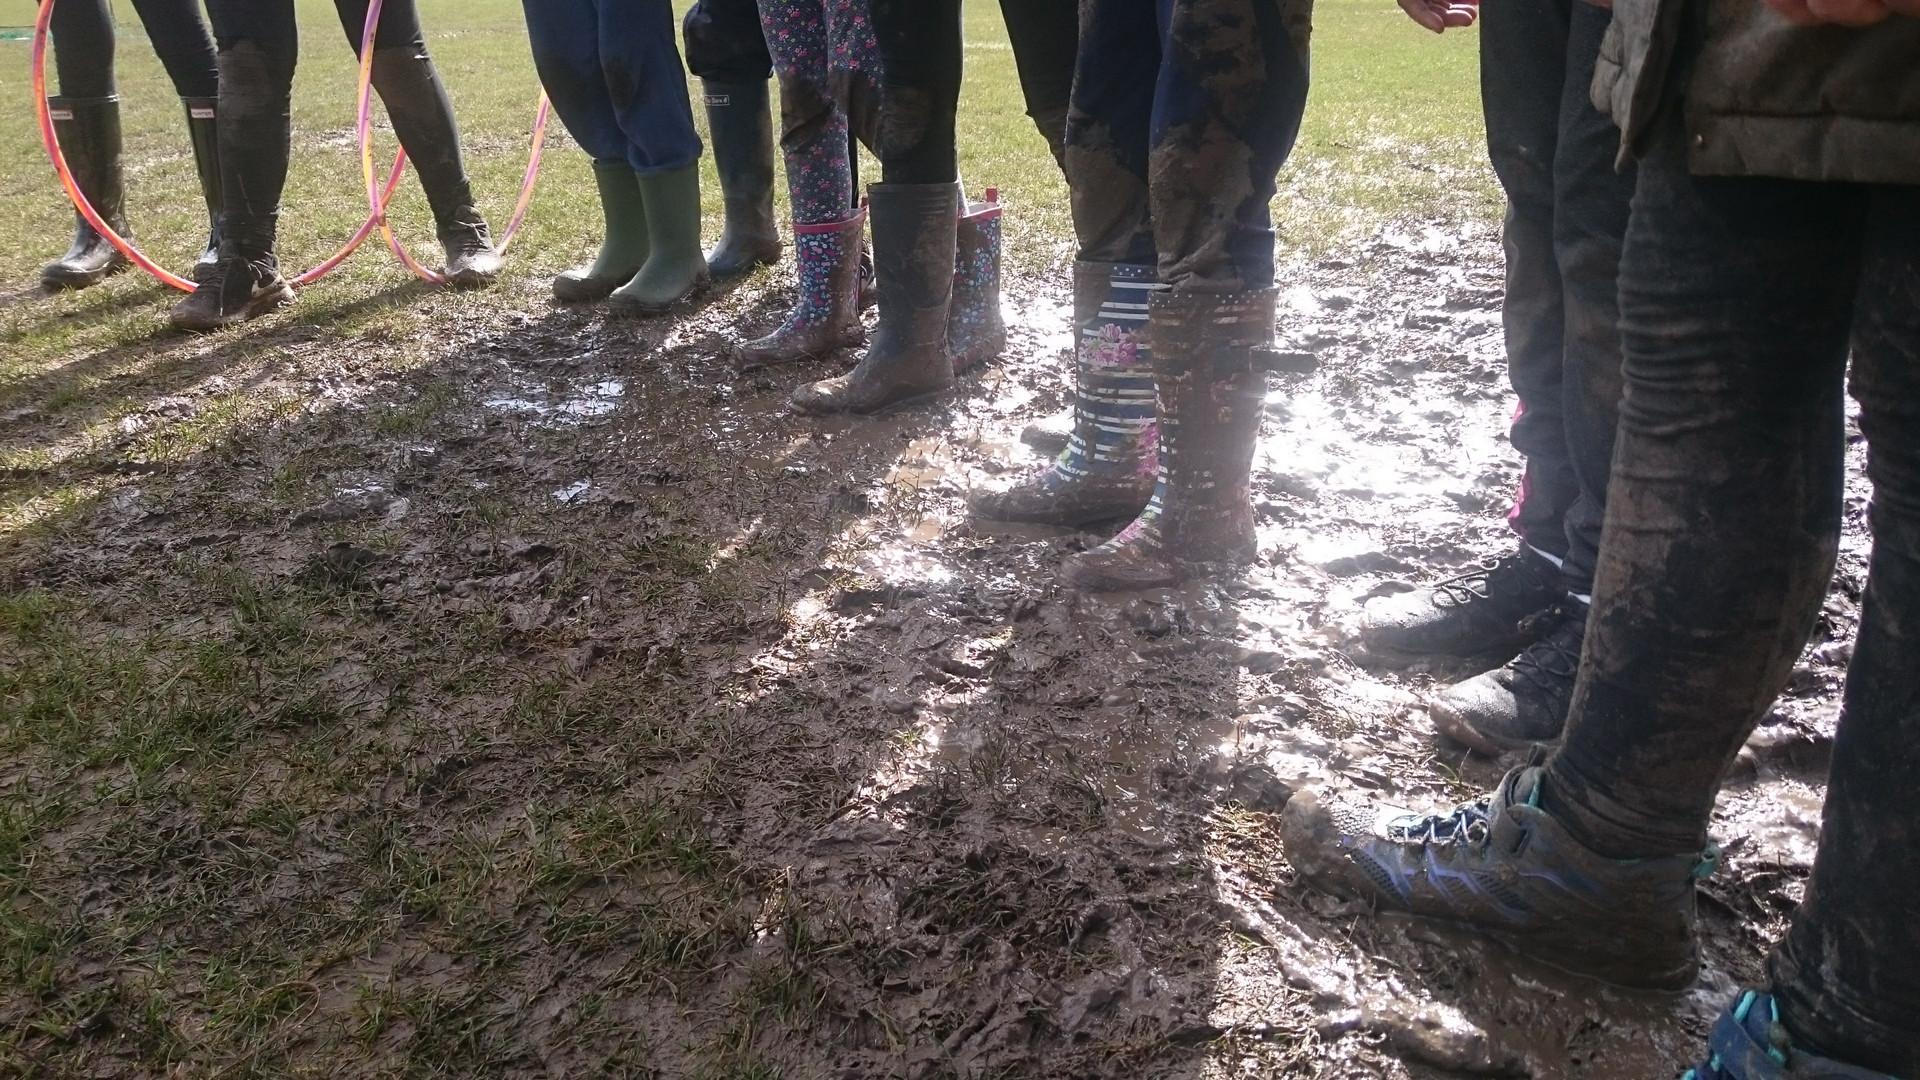 Mud mud glorious mud...